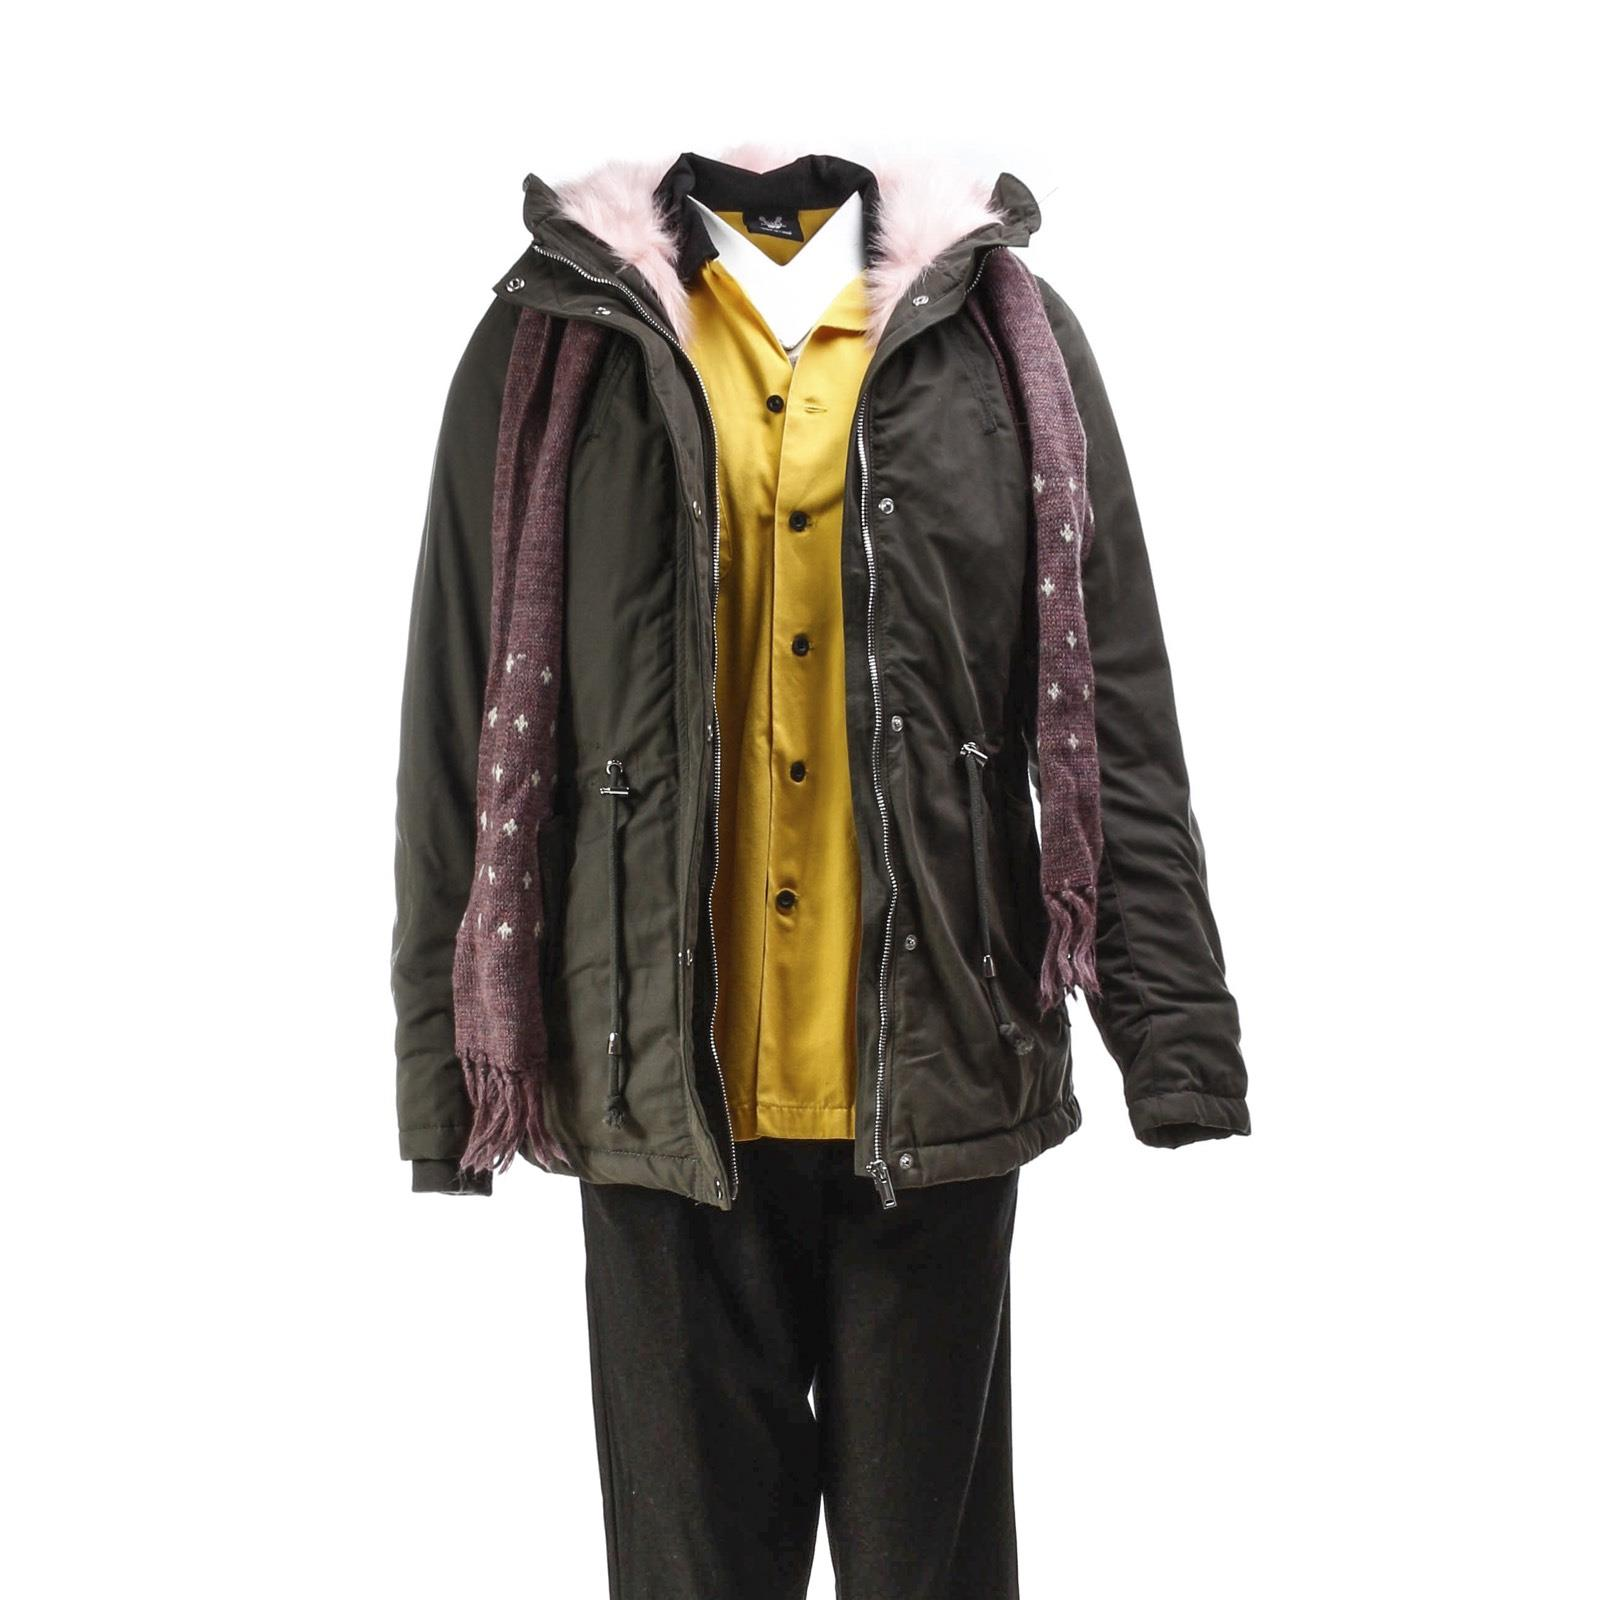 OITNB-Tamika-Susan-Heyward-Screen-Worn-Coat-Shirt-Set-Pants-amp-Scarf-Ep-608